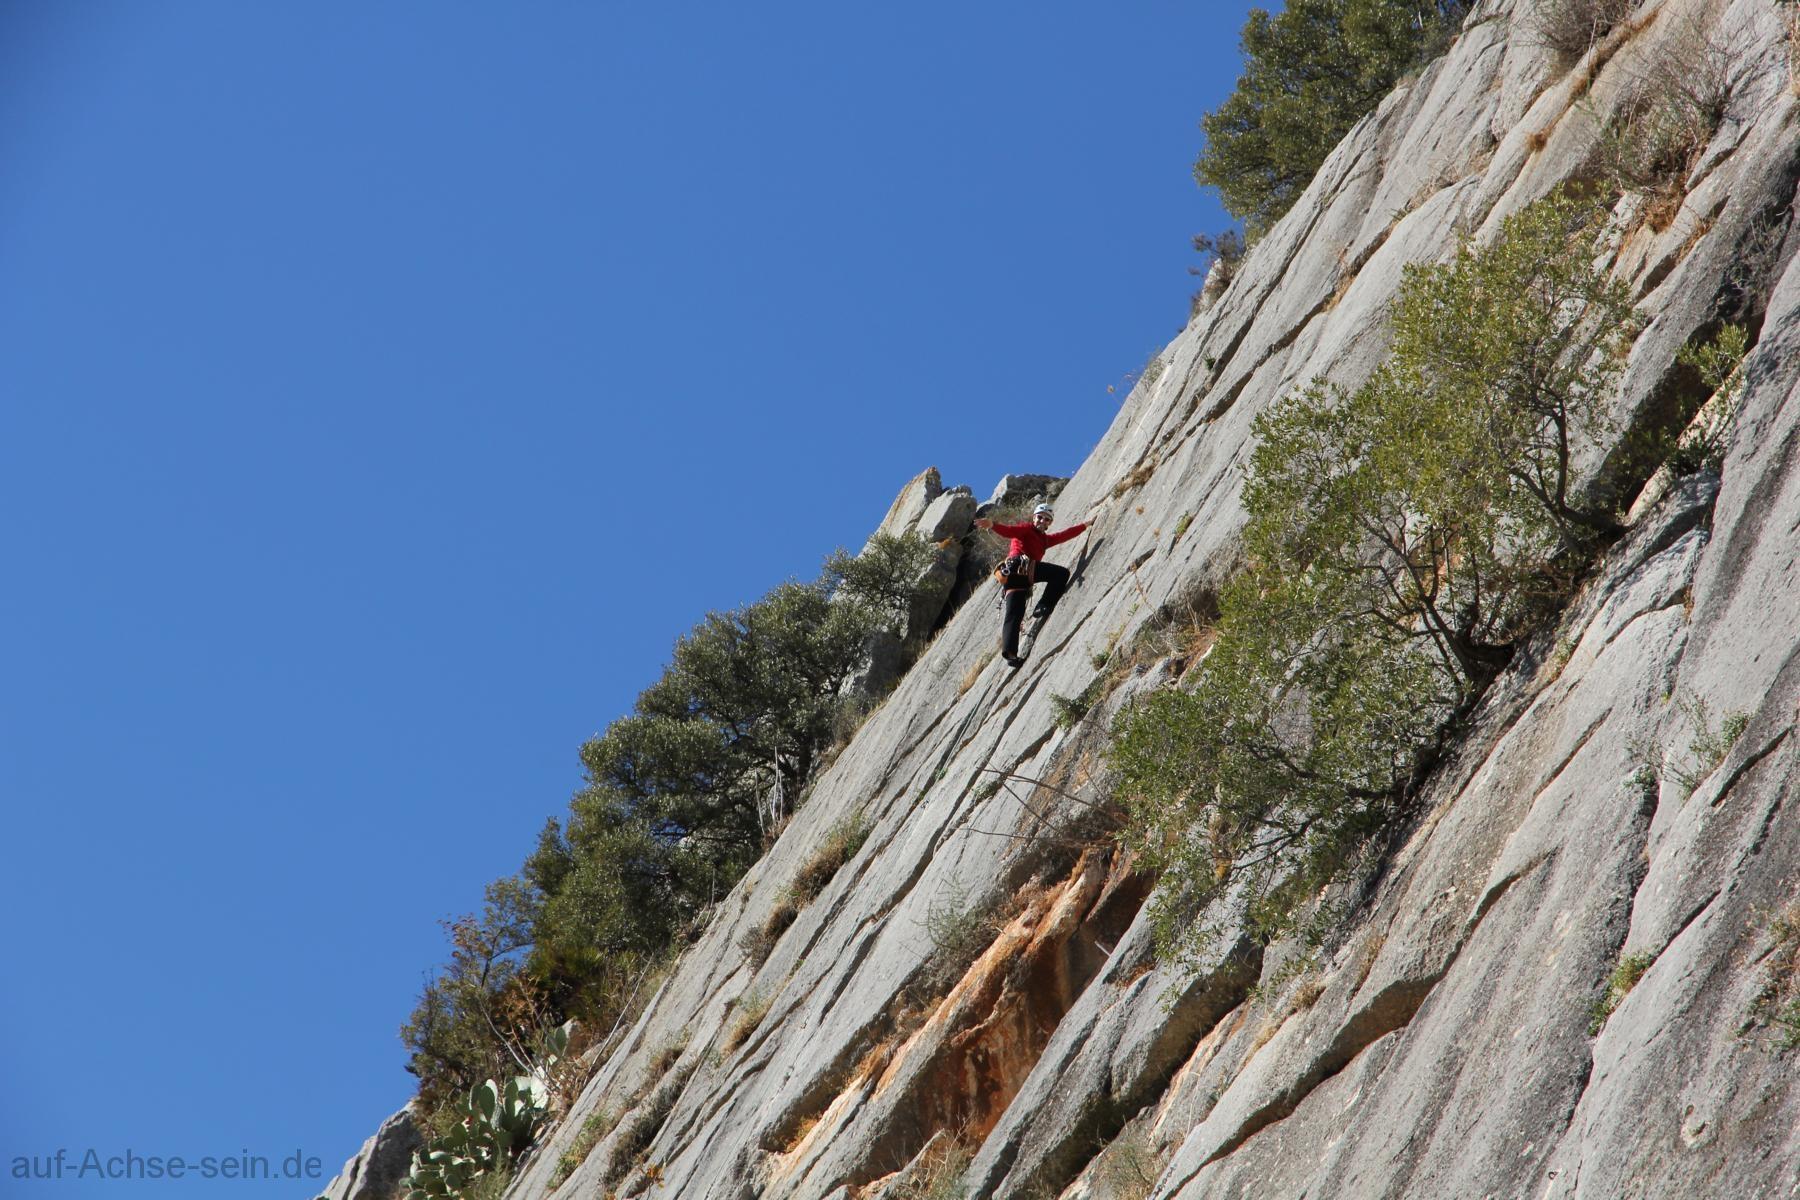 Spanien, El Chorro, klettern